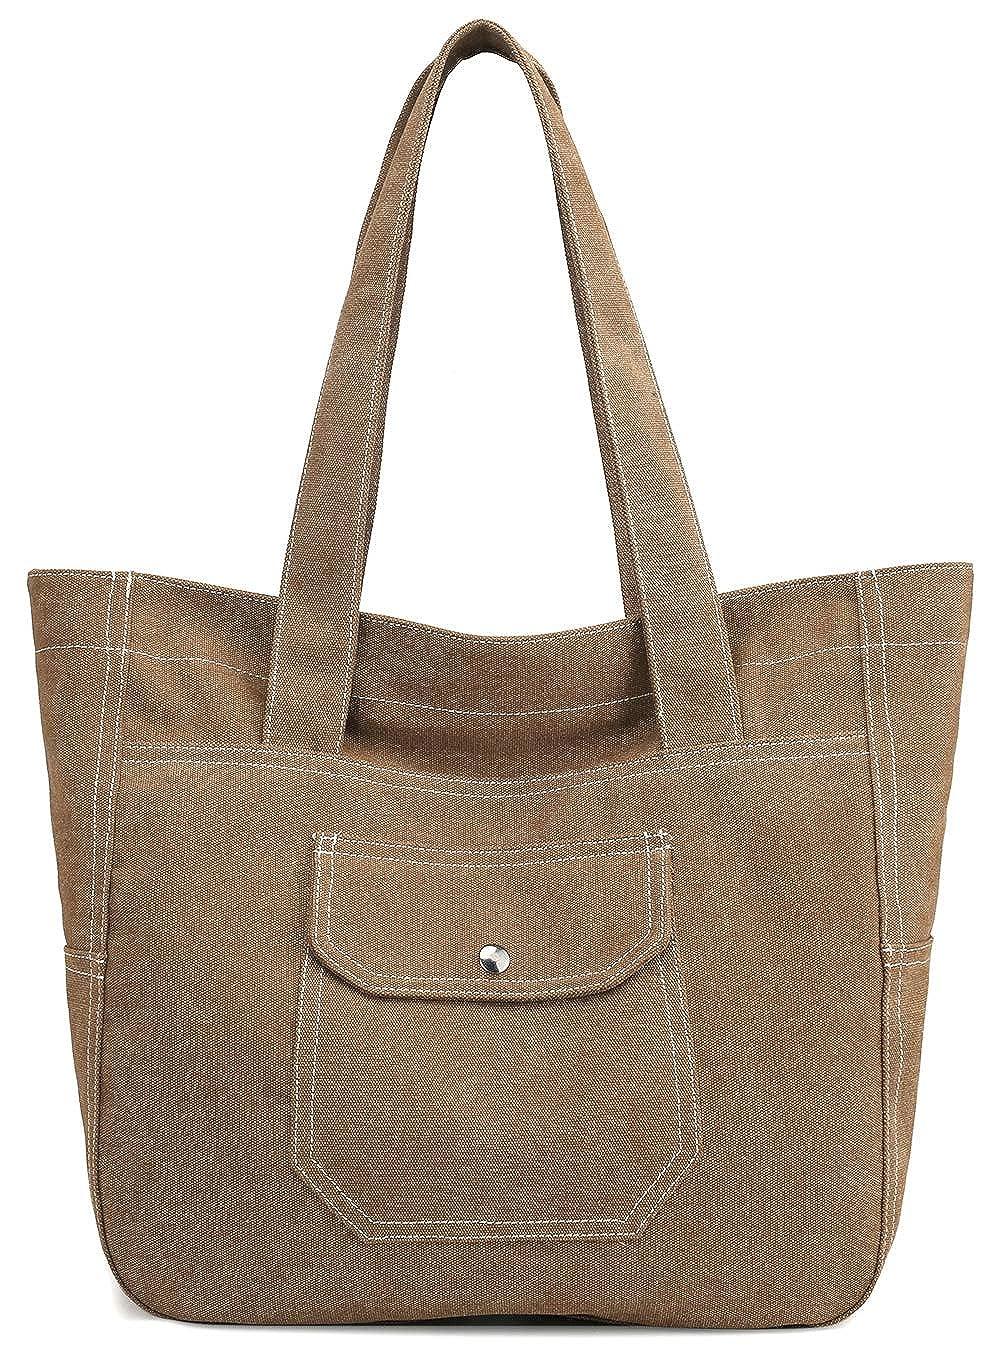 0b6321bb39fa Canvas Tote Bag for Women Large School Shoulder Bag Work Satchel Handbag